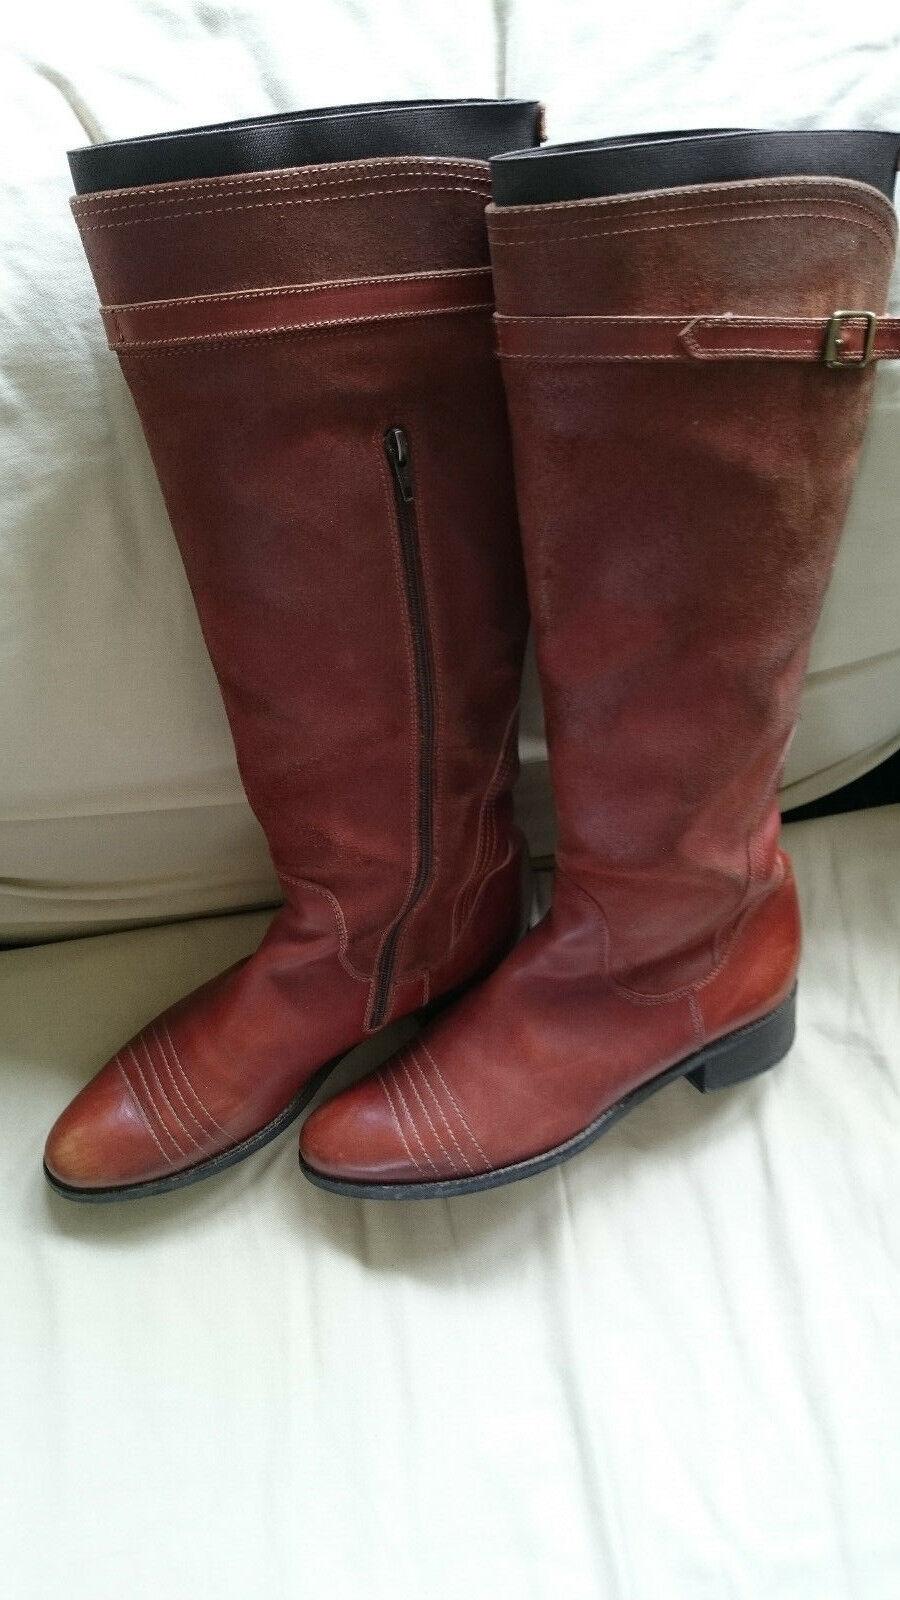 MAX MARA  Stiefel Stiefelette Stiefel Stiefelies 41 NP  wNeu UK 8 US 10